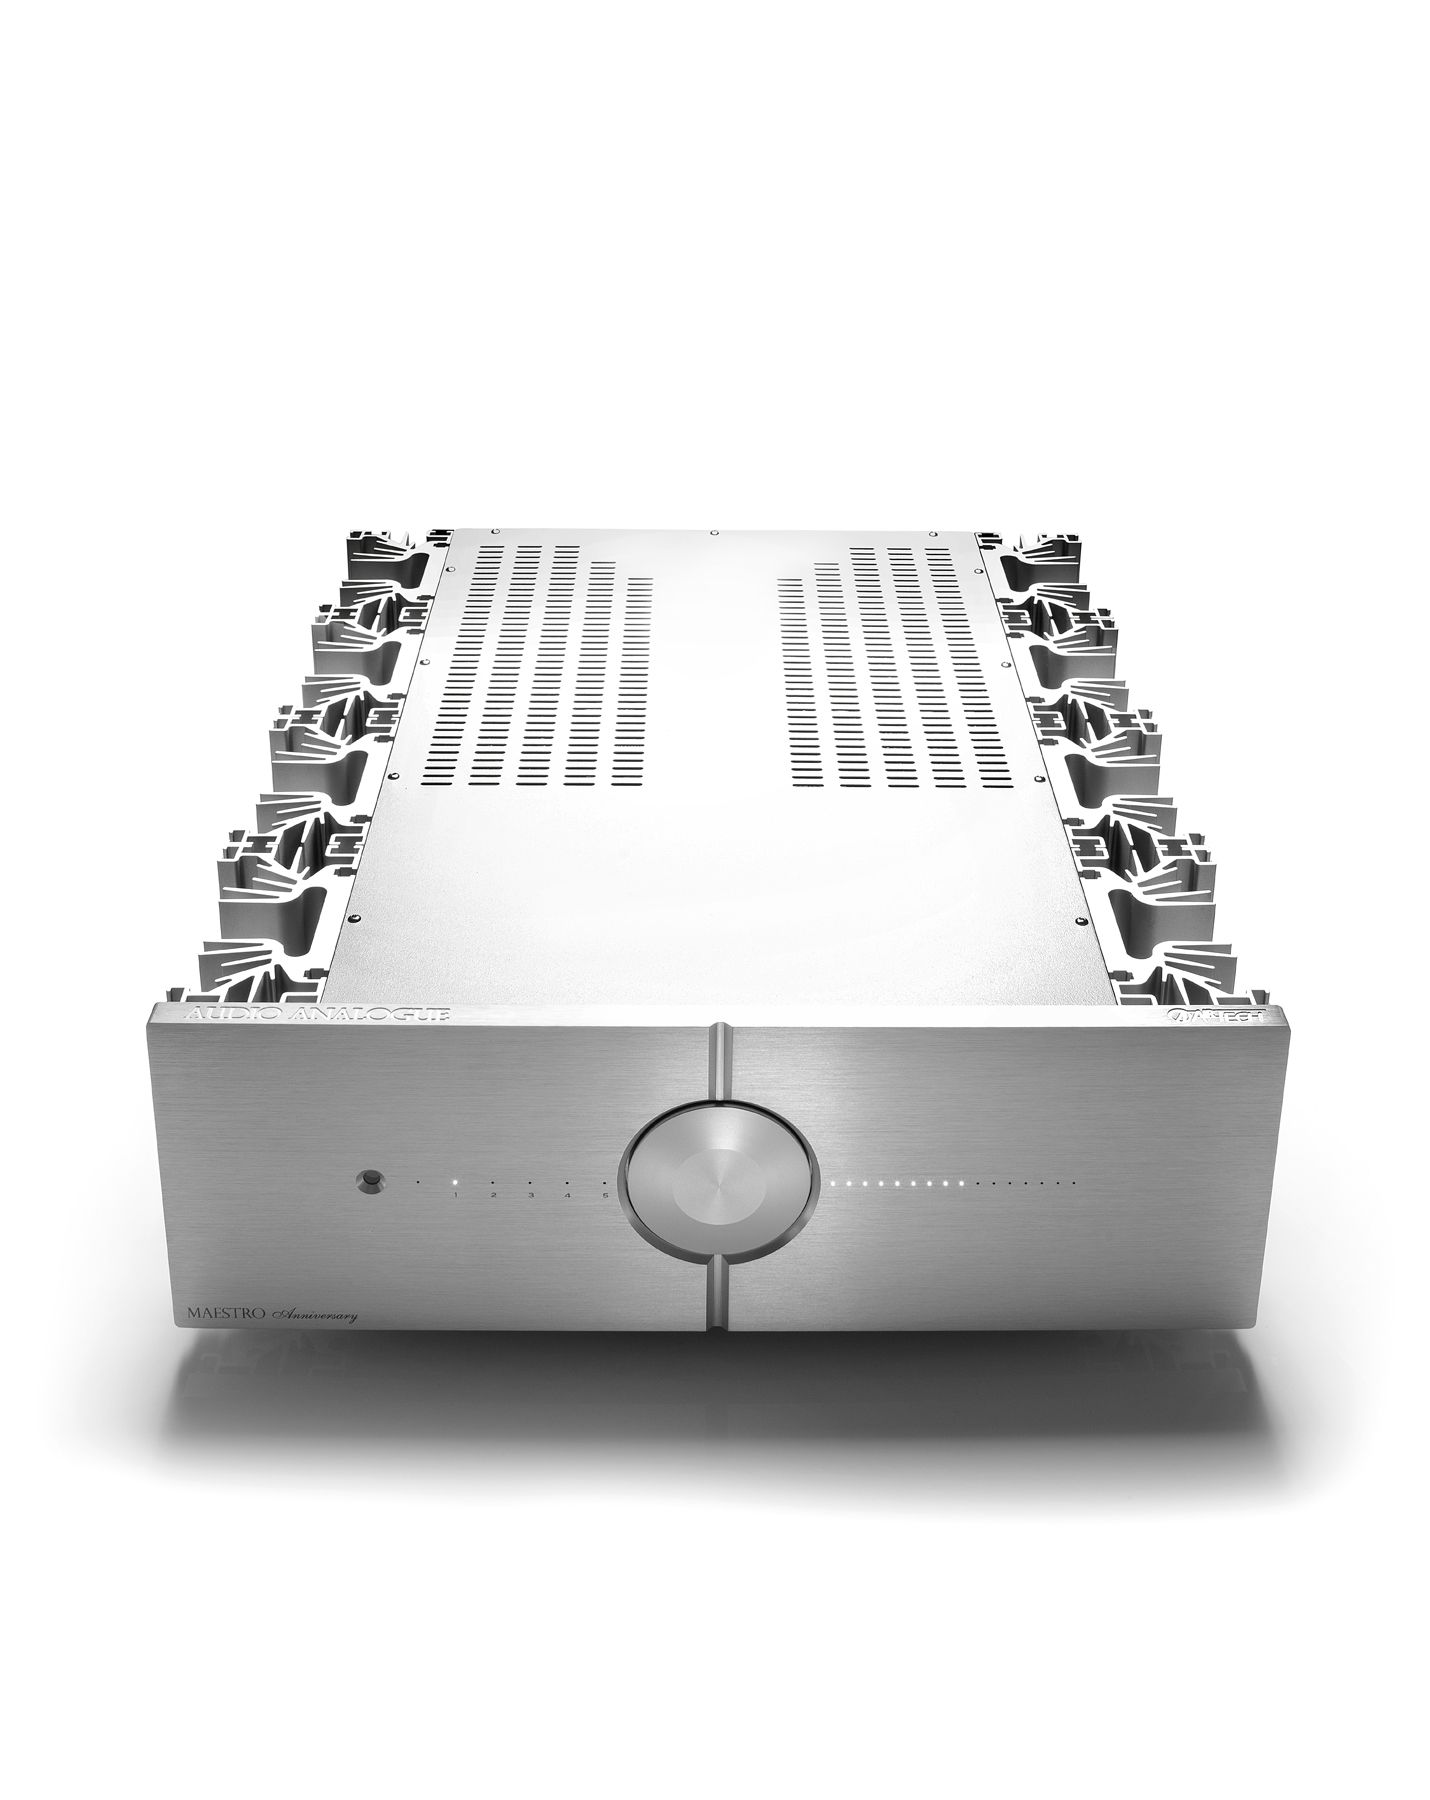 Audio Analogue Maestro audioperfect